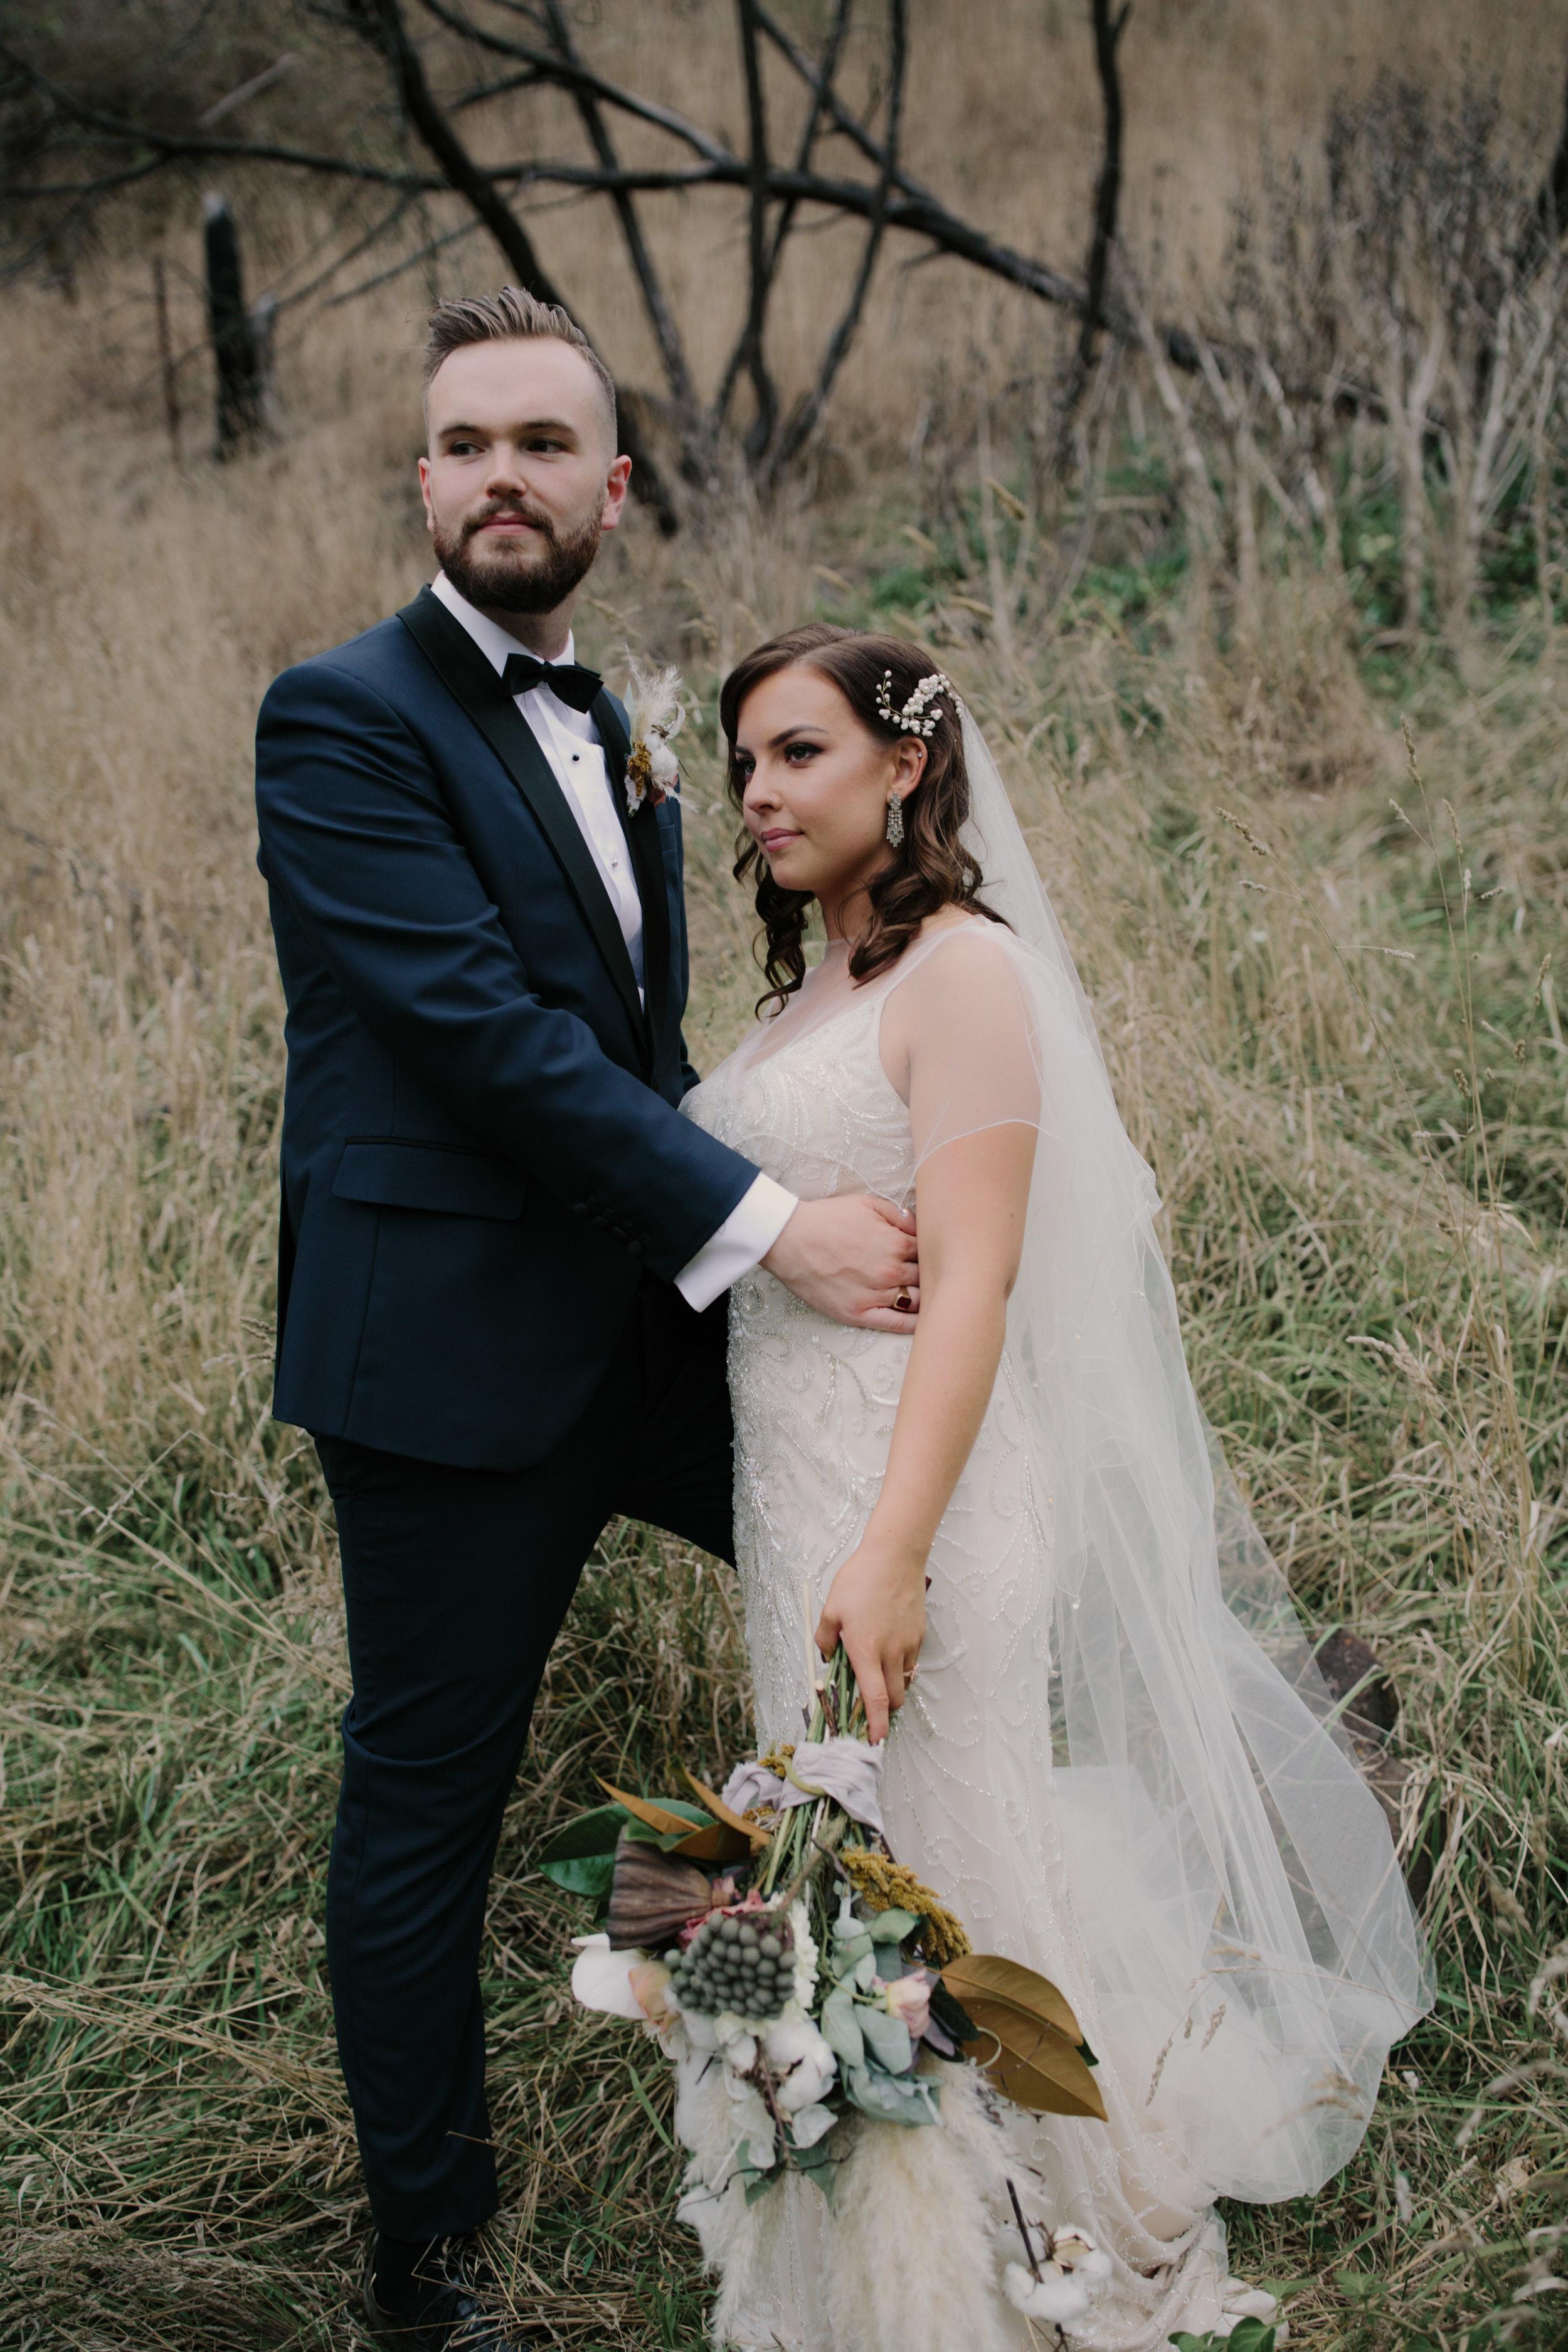 I-Got-You-Babe-Weddings-Melanie-Isaac0579 (1).JPG